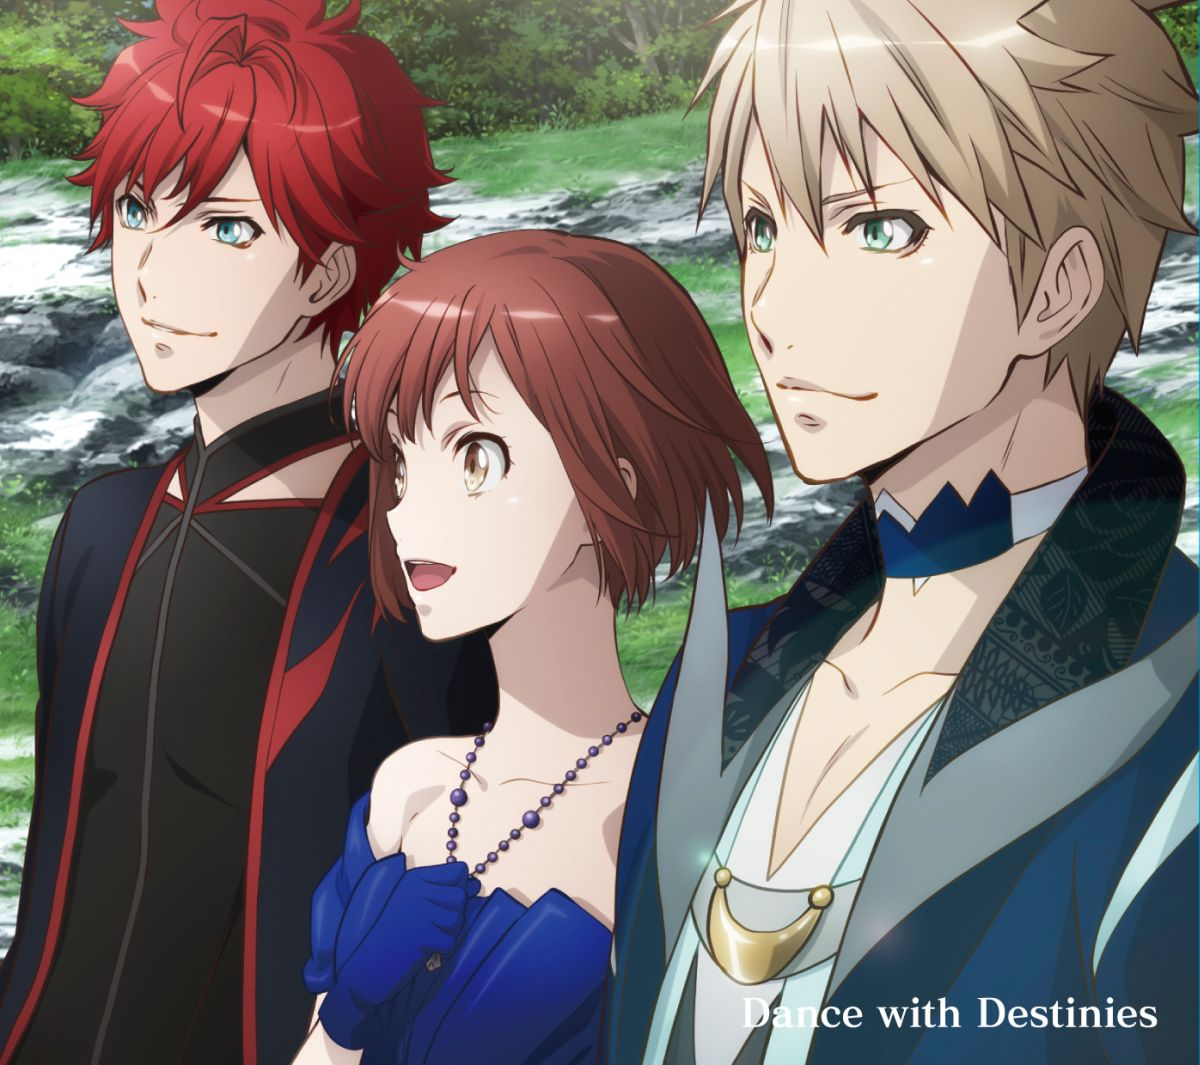 TVアニメ『Dance with Devils』ミュージカルコレクション「Dance with Destinies」画像